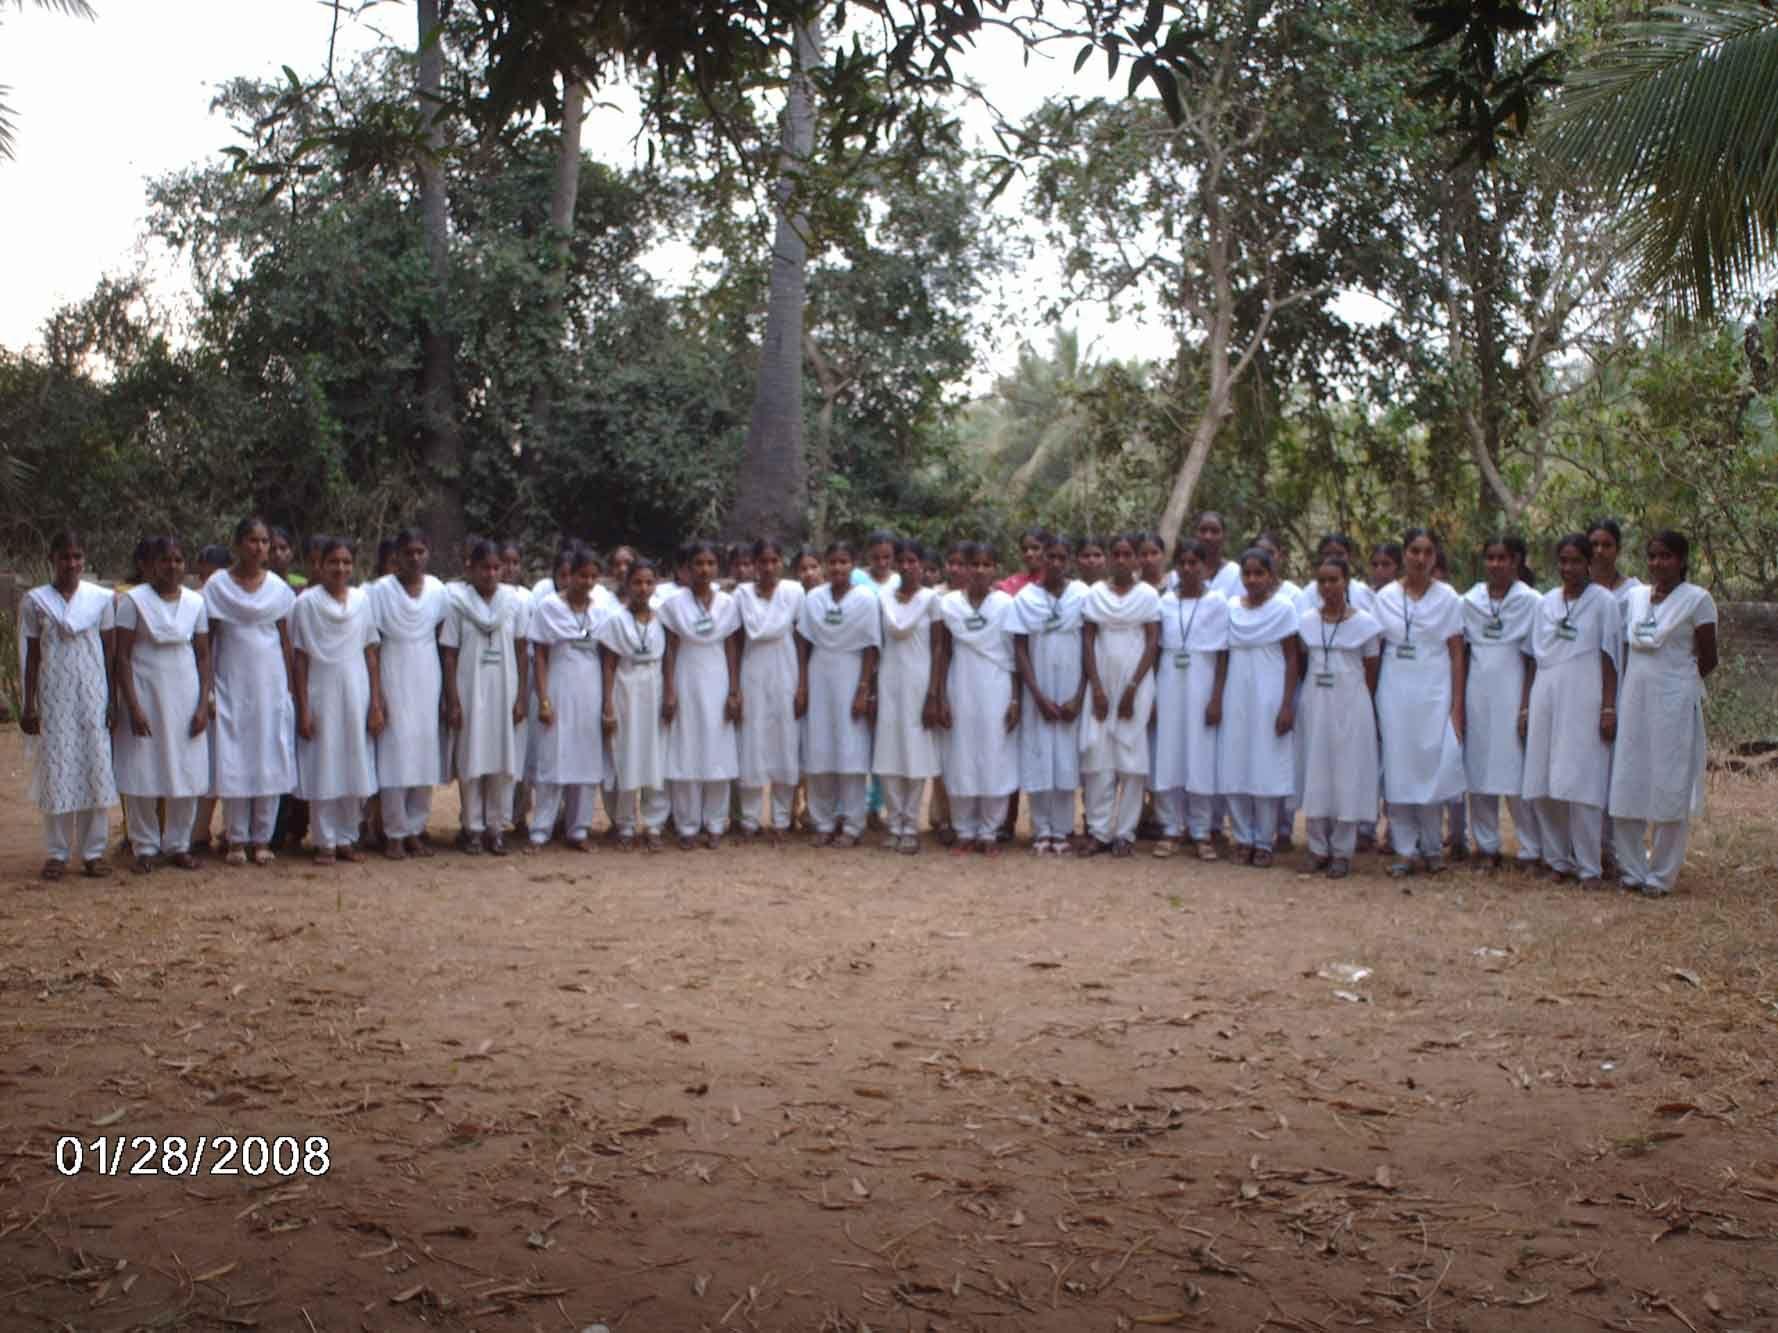 apostolic pentecostal bible colleges